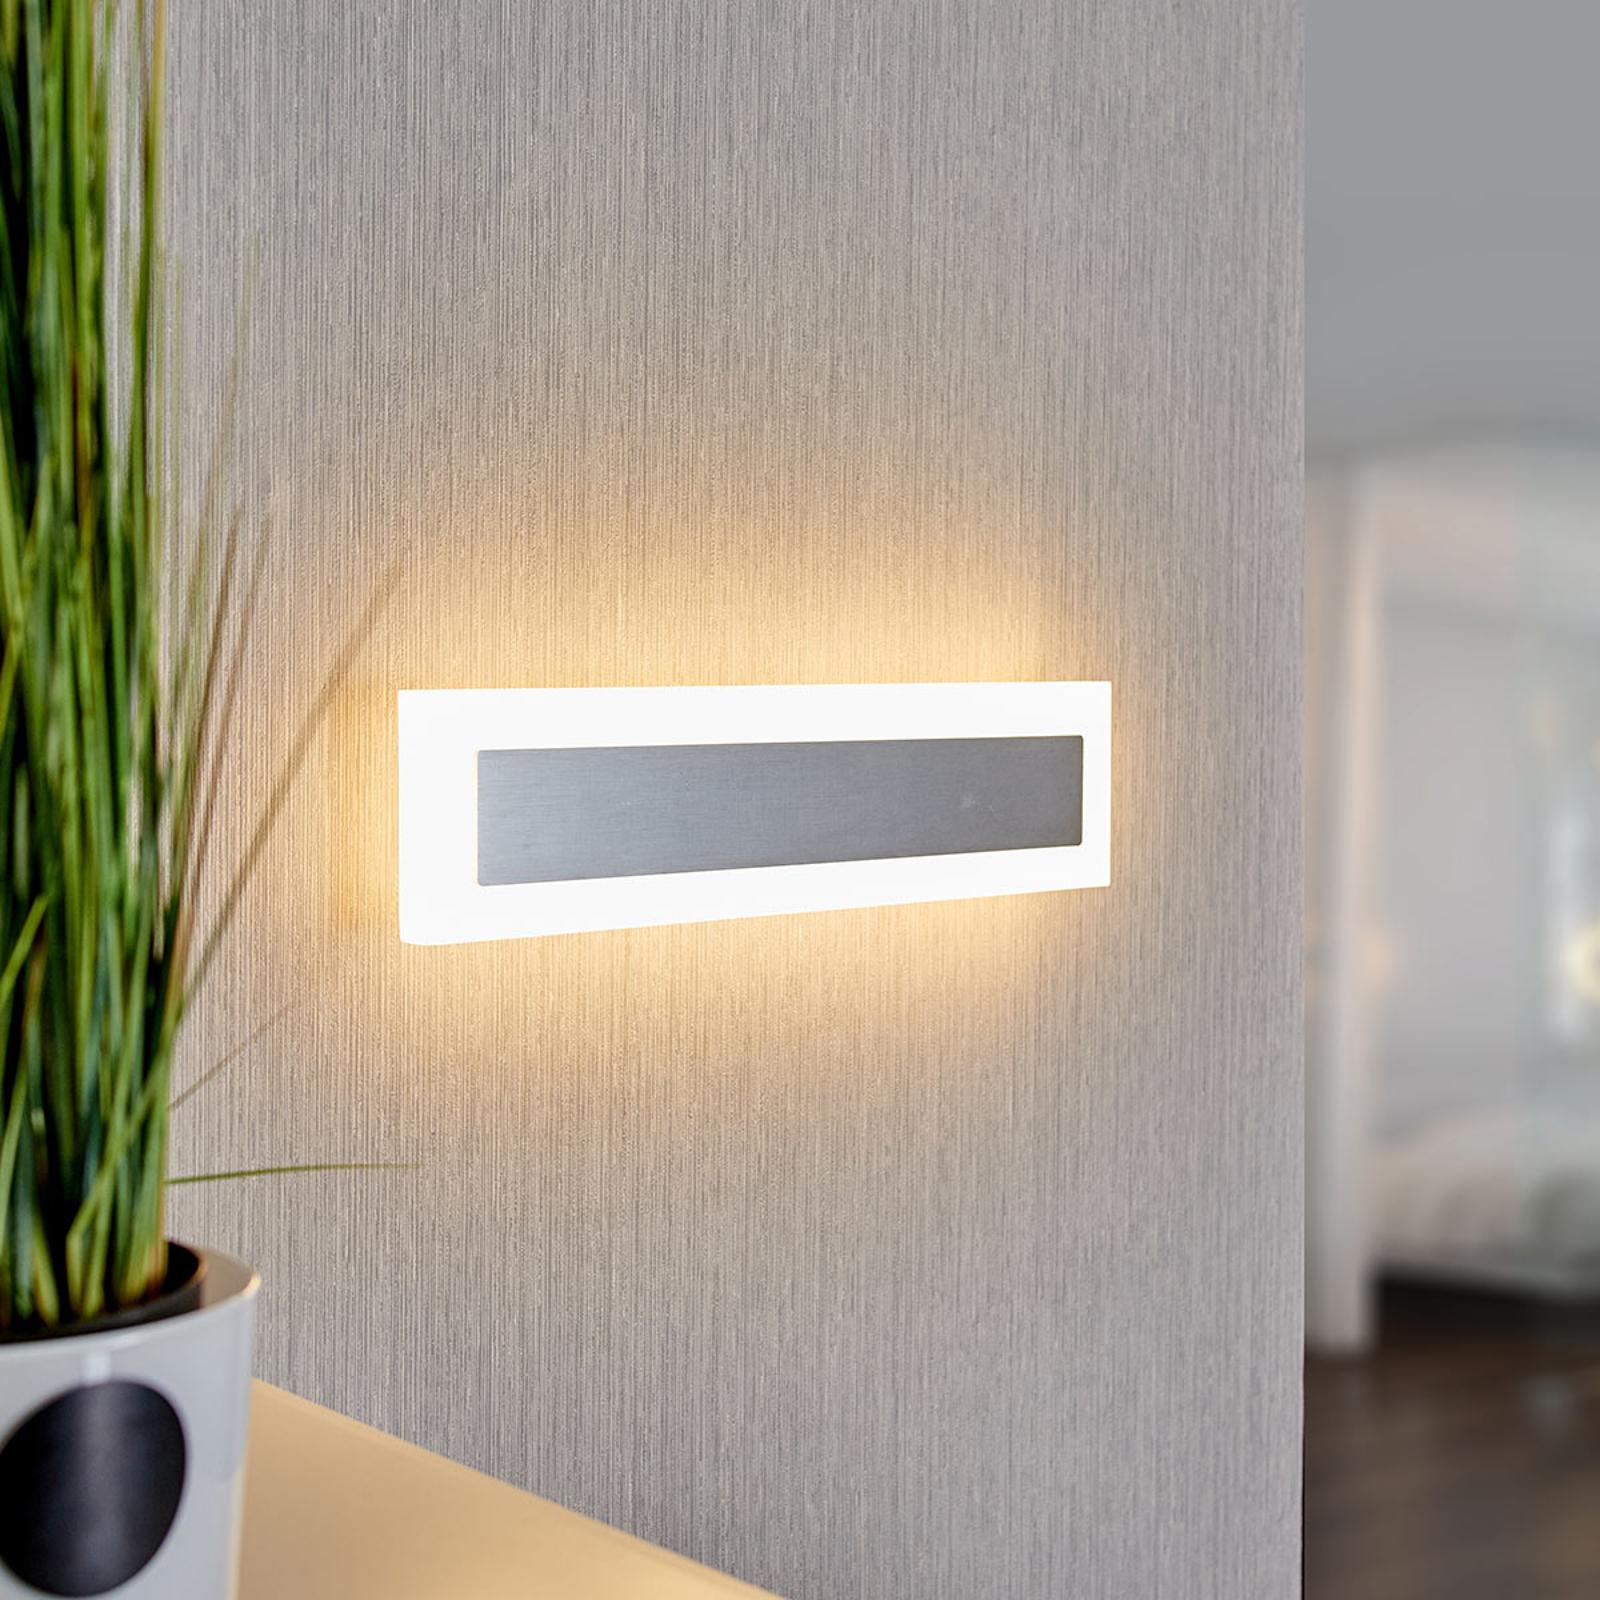 Lámpara de pared LED Marle con forma rectangular